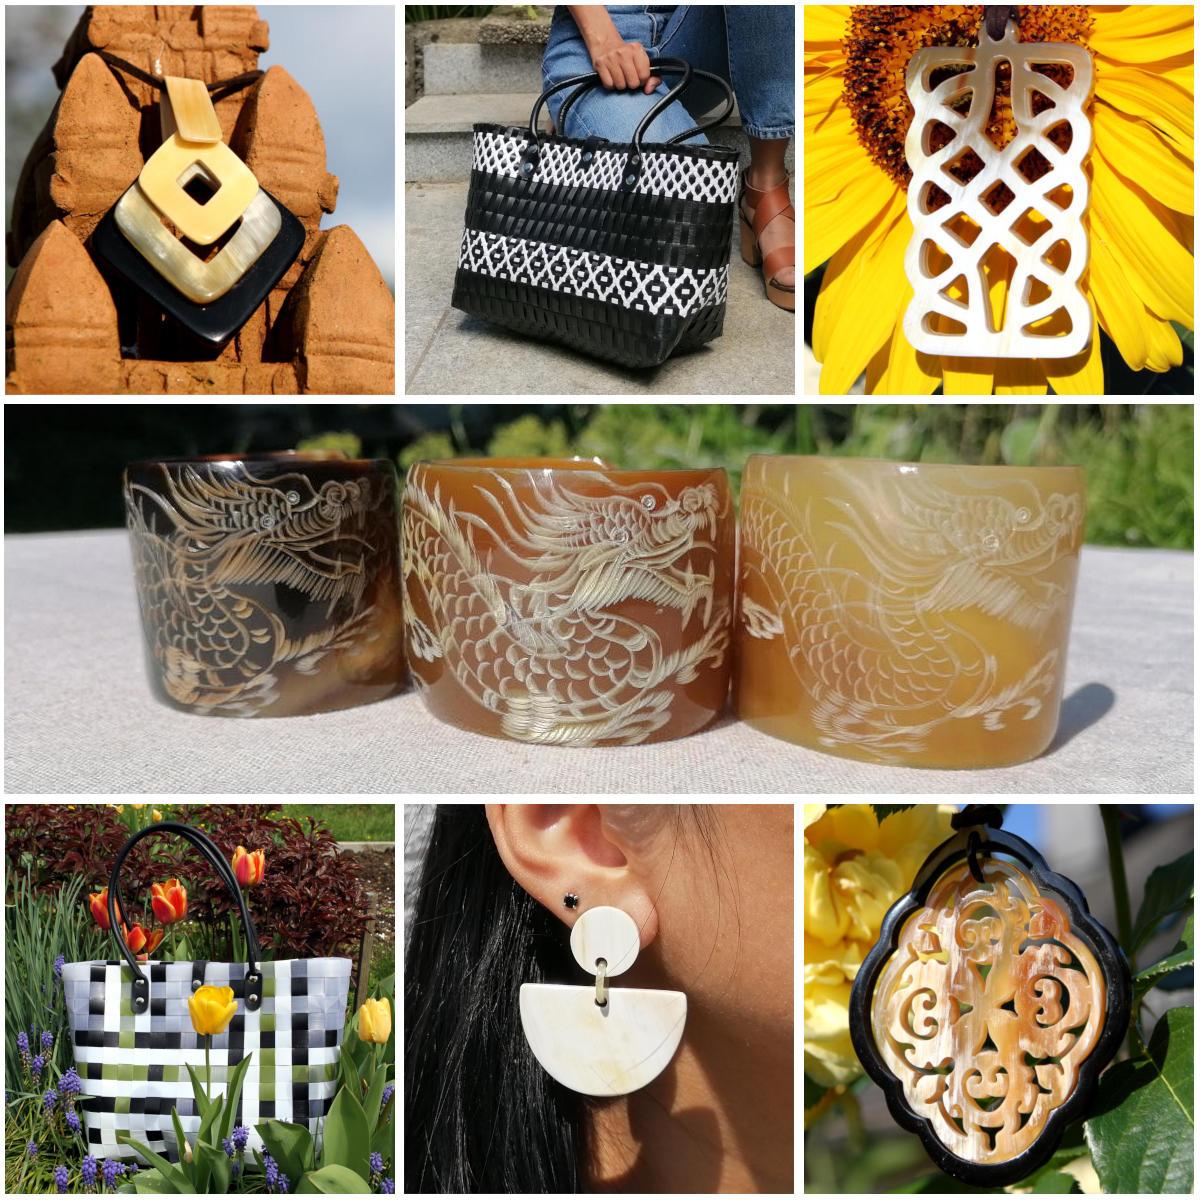 Avanova horn jewellery, bags, accessories